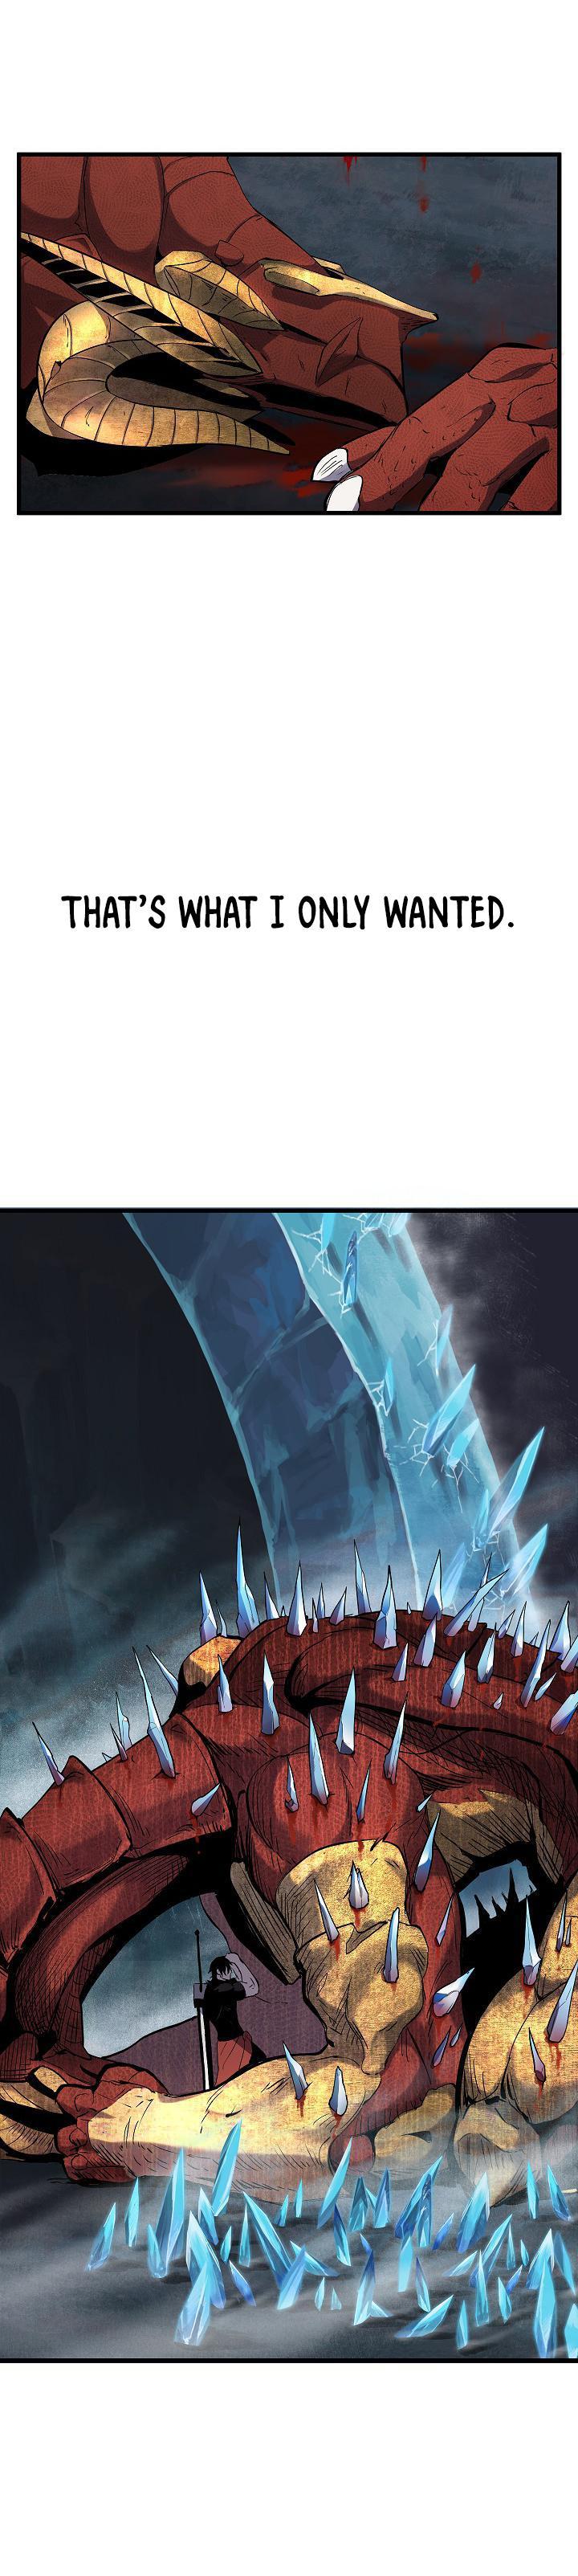 Survival Story Of A Sword King In A Fantasy World Vol.1 Chapter 19 page 4 - Mangakakalots.com